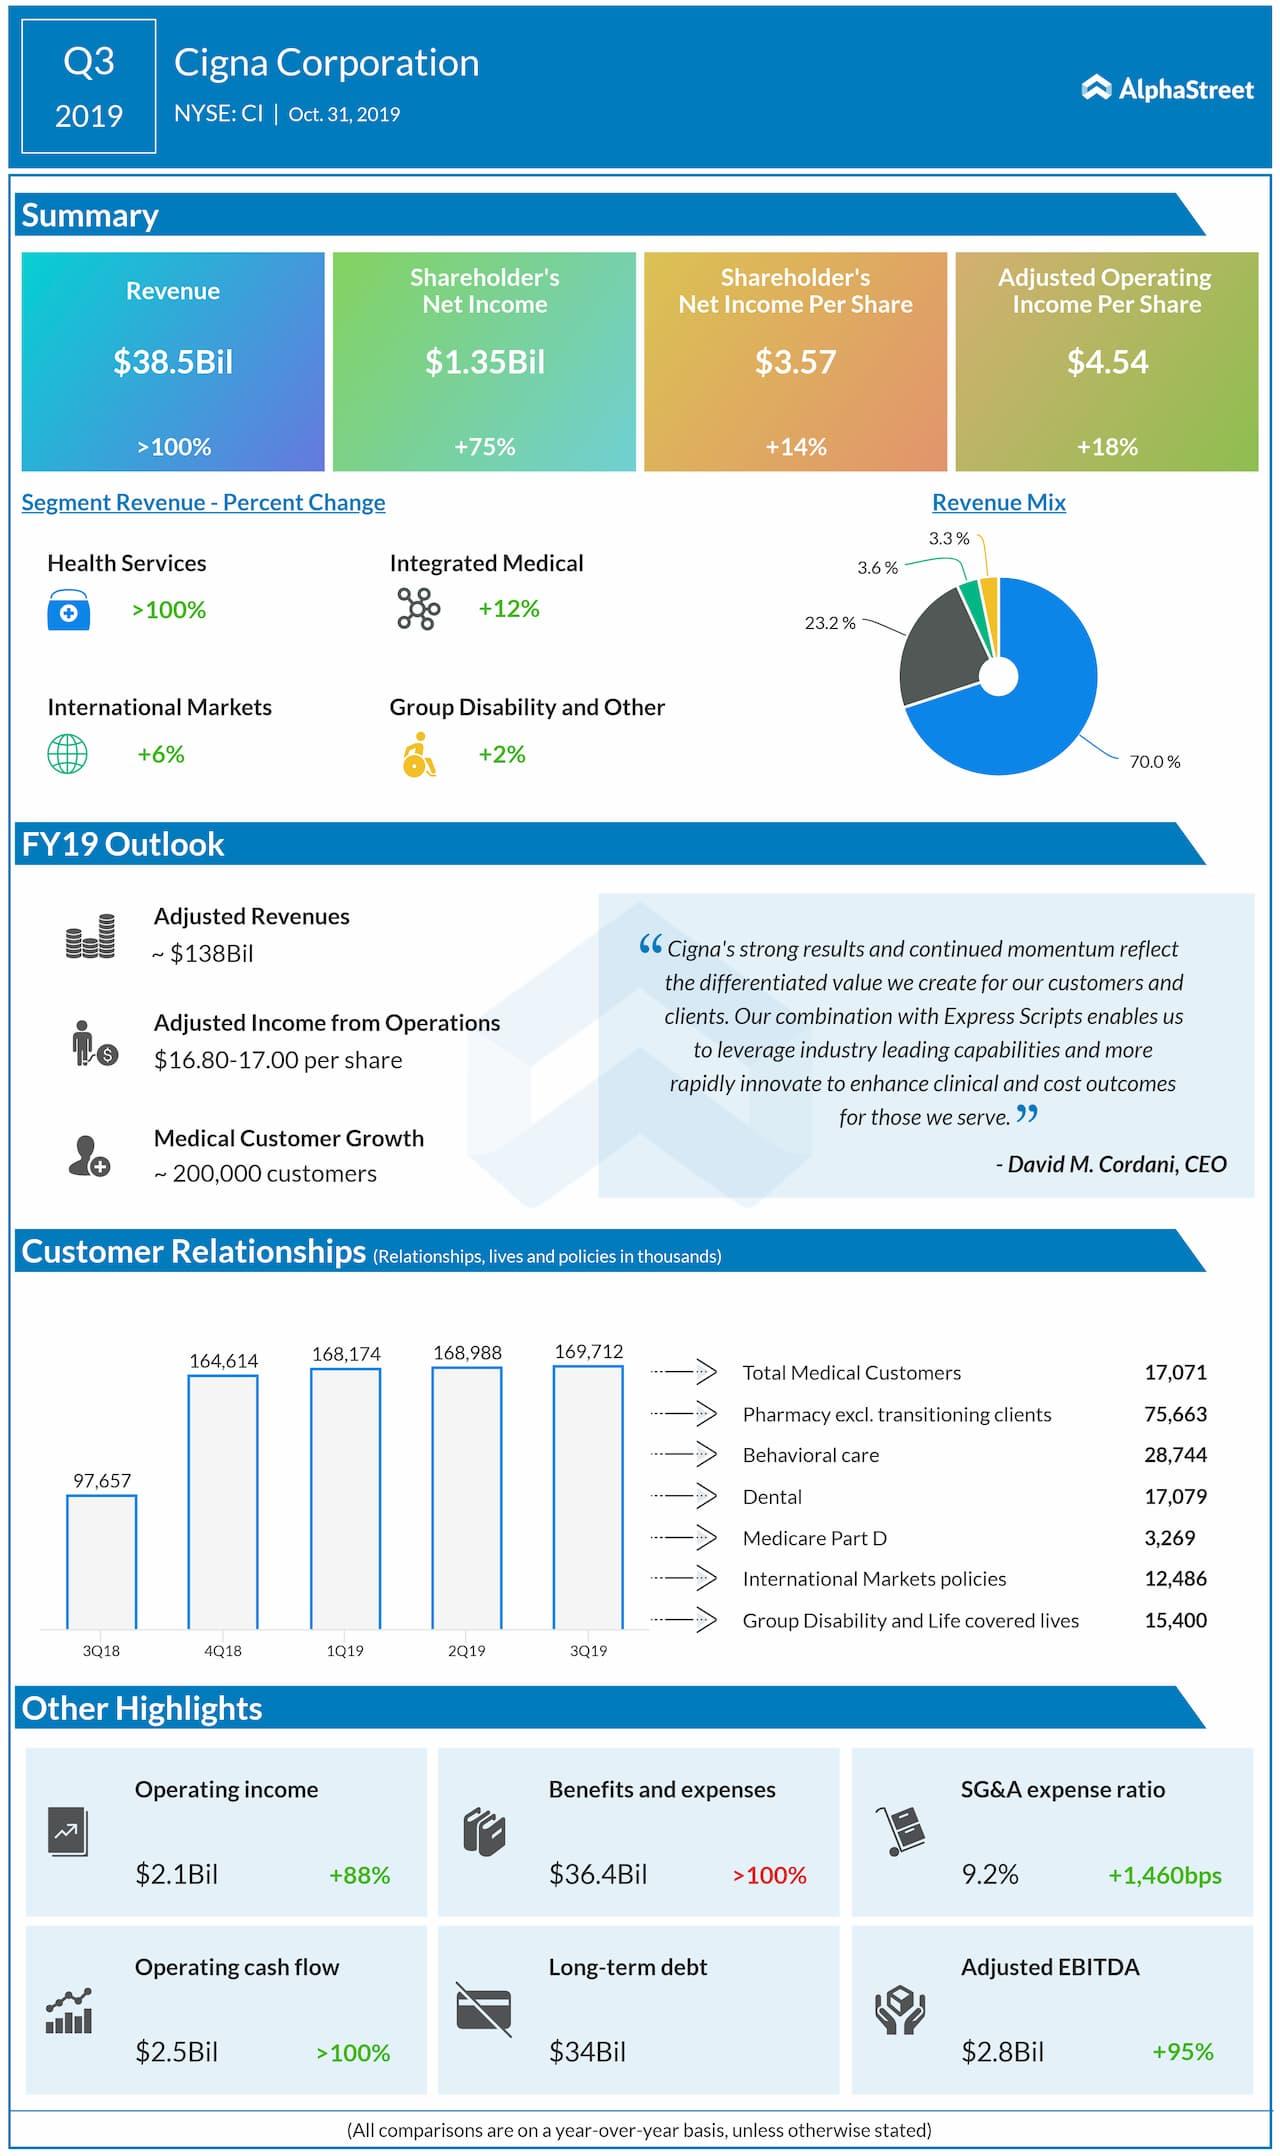 Cigna (NYSE: CI): Q3 2019 Earnings Snapshot